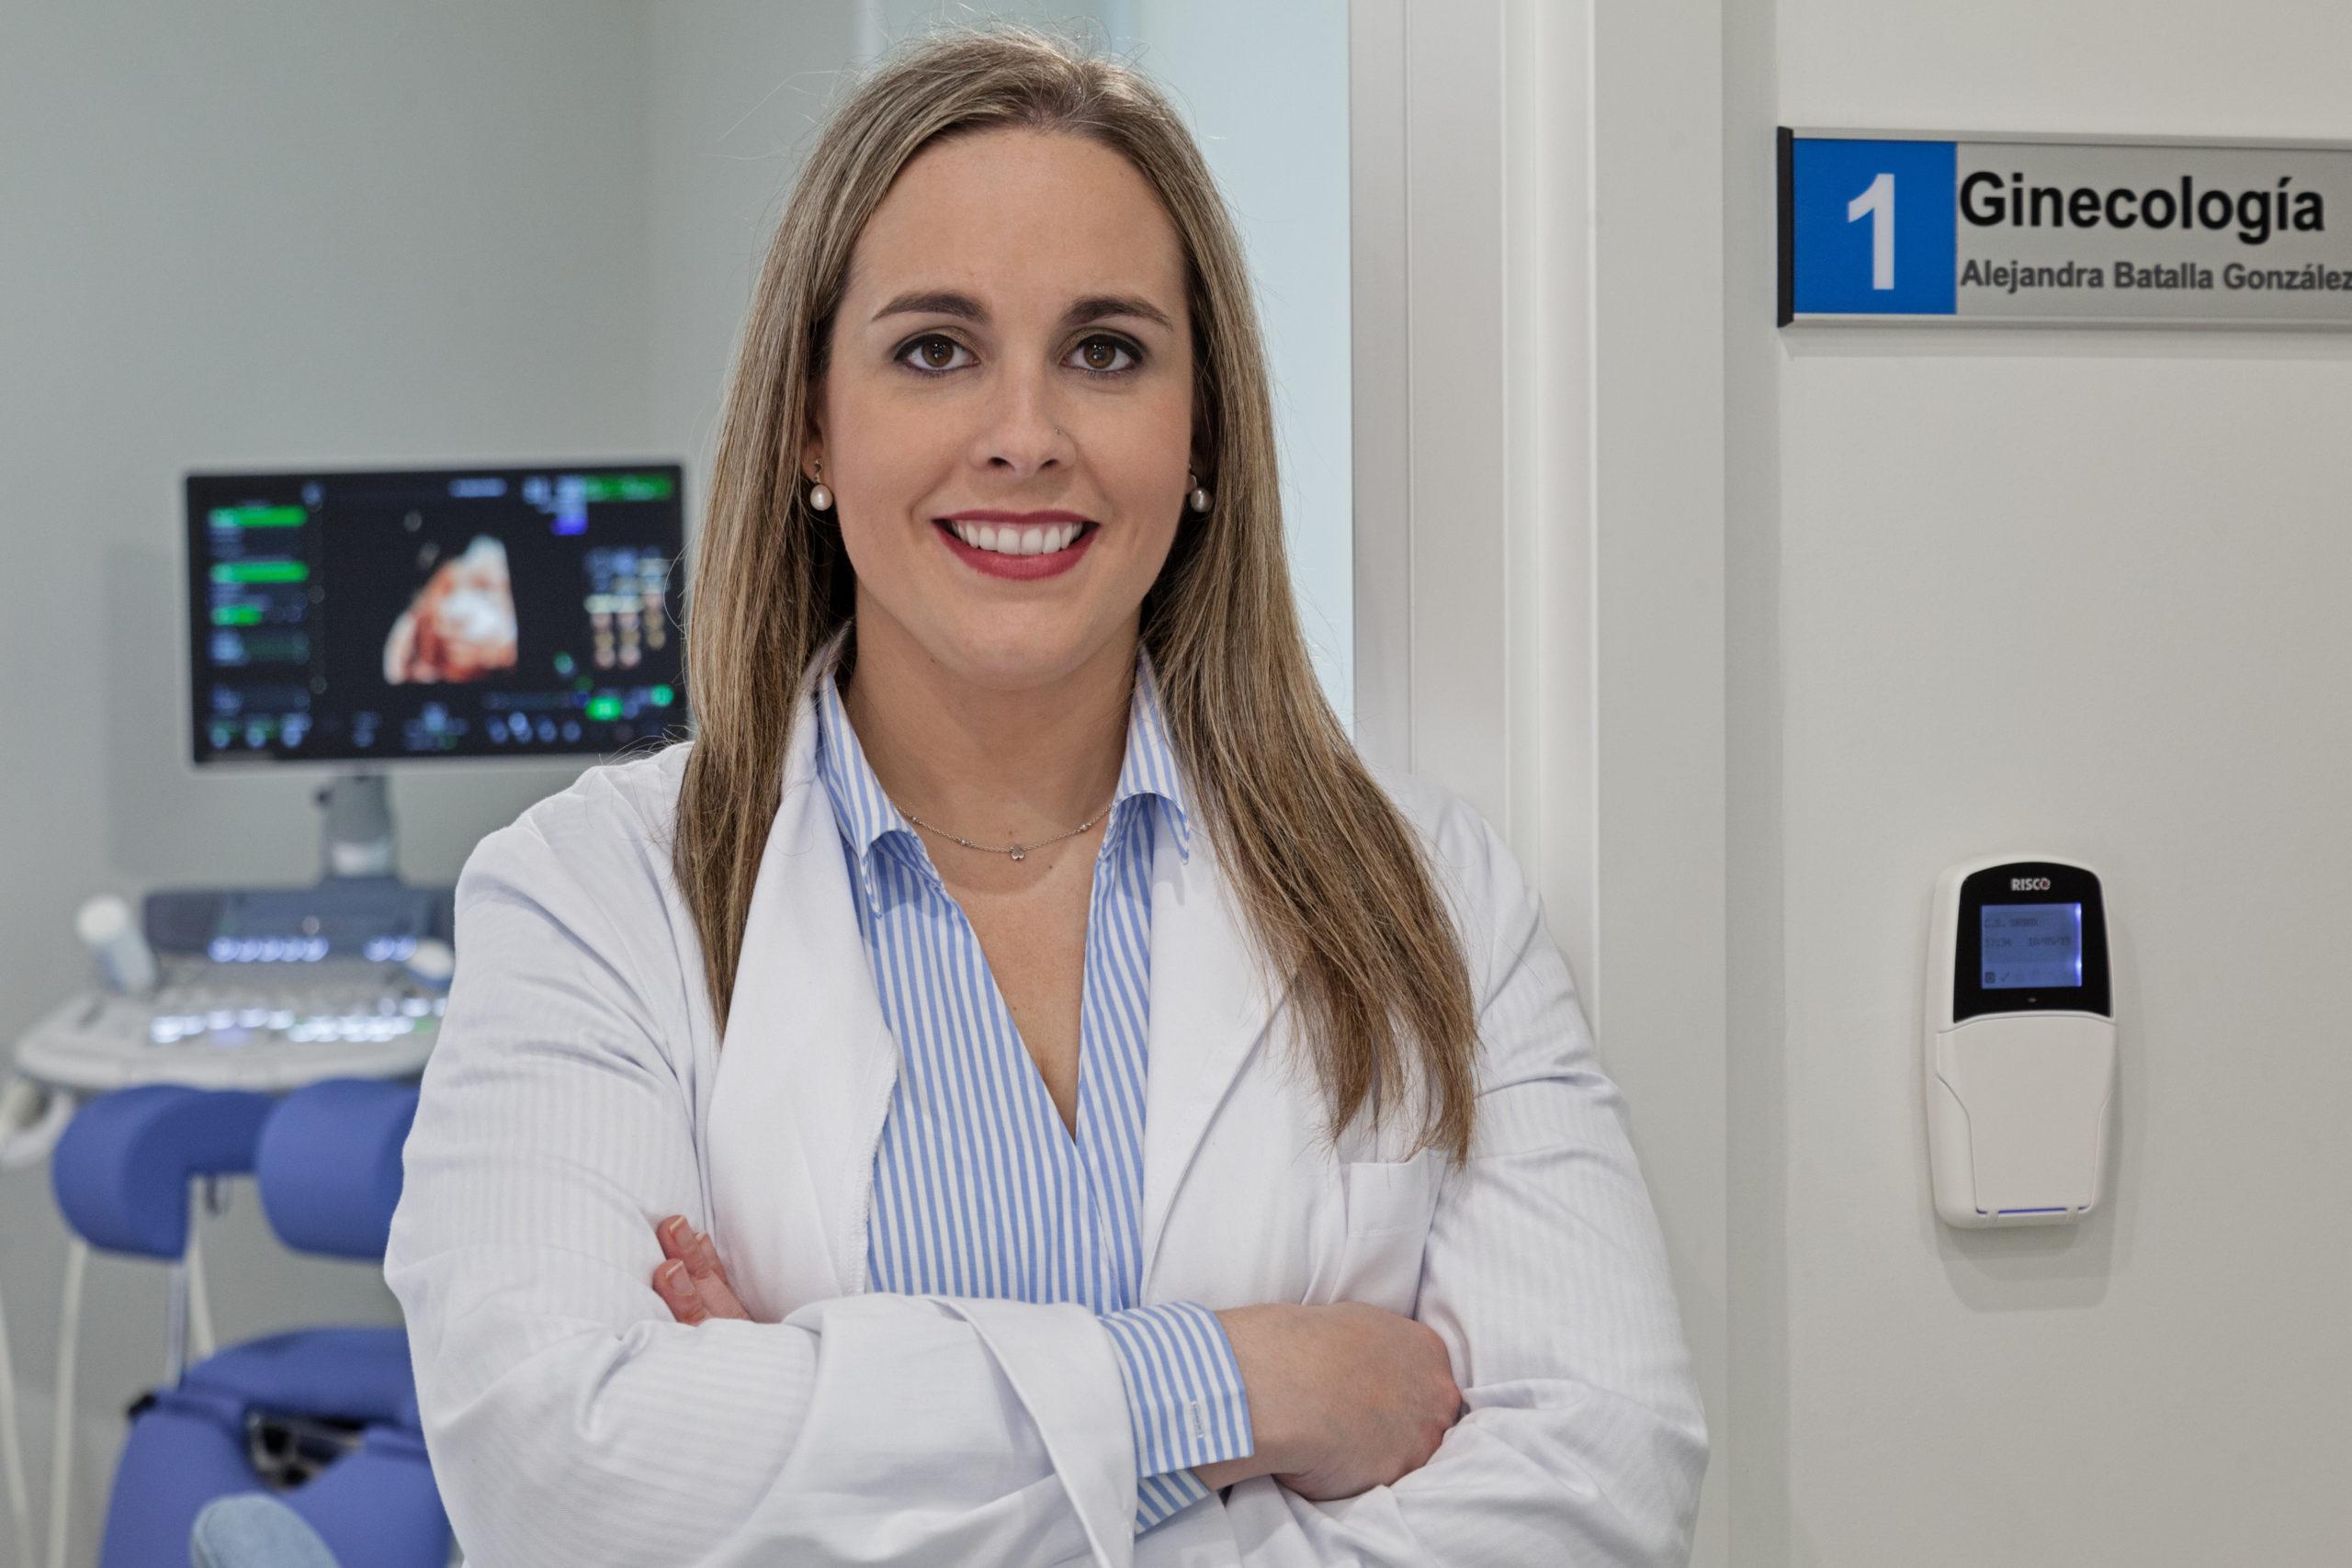 Dra. Alejandra Batalla González - Ginecología. Centro Sanitario Urdax.